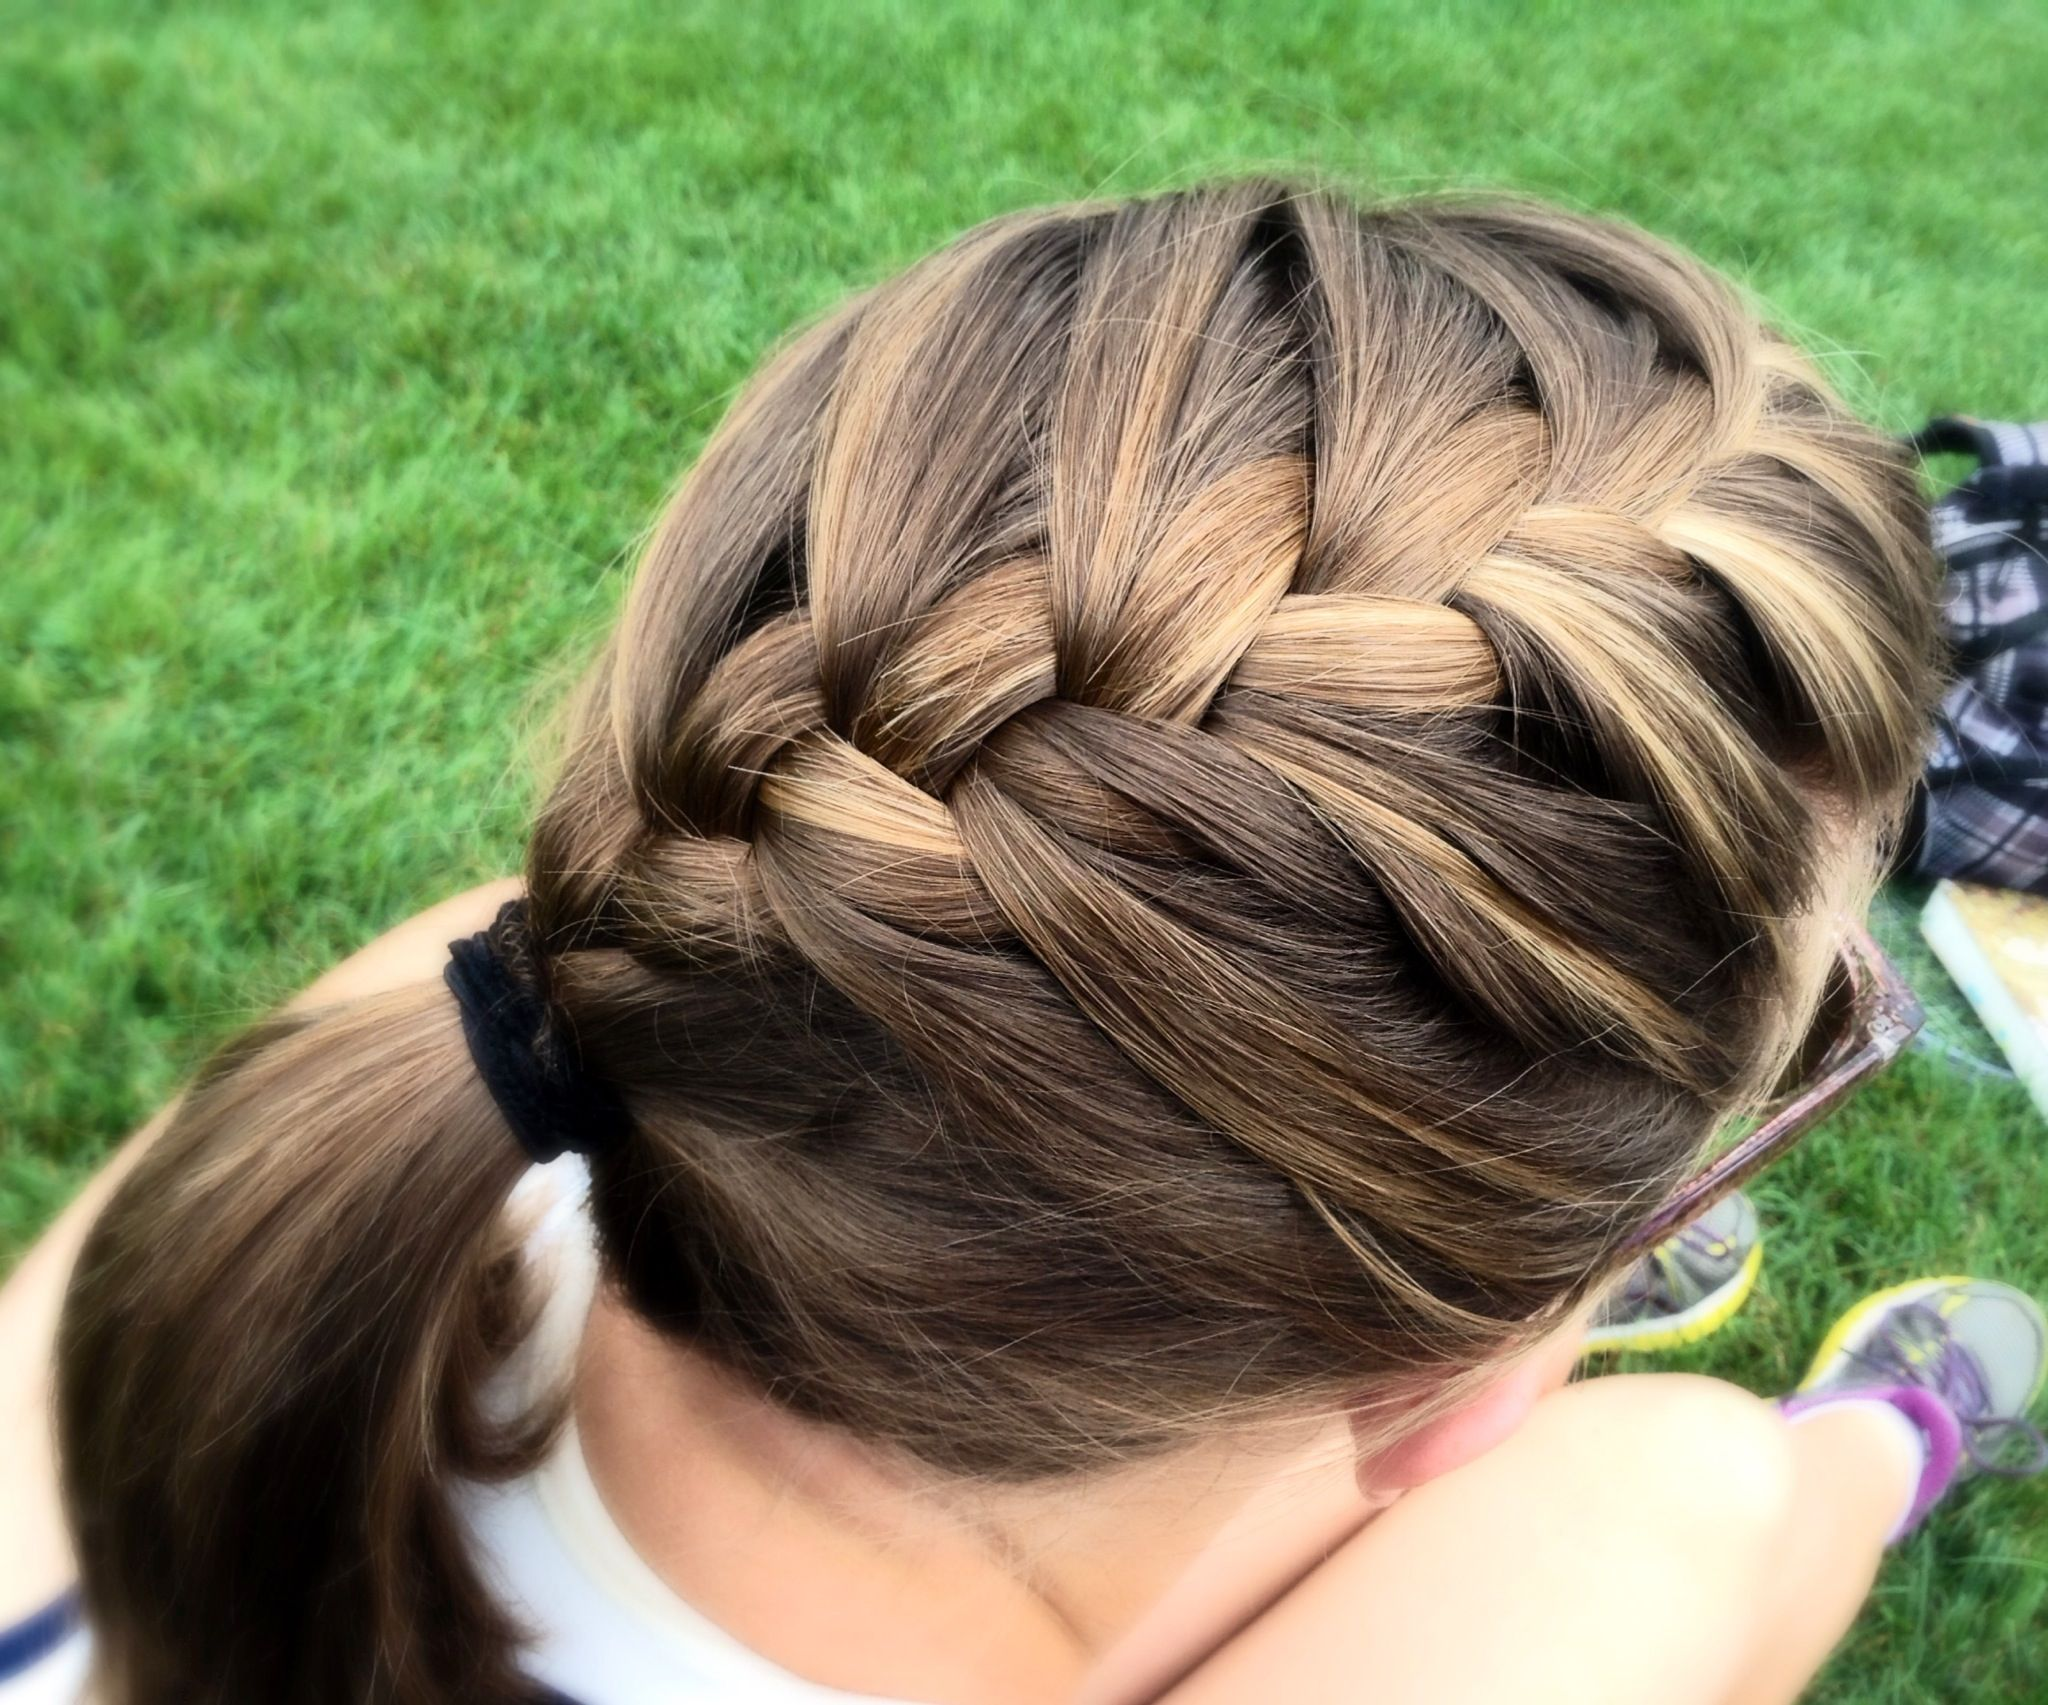 French Braid Ponytail | My hairstyles | Braided ponytail, Hair ...